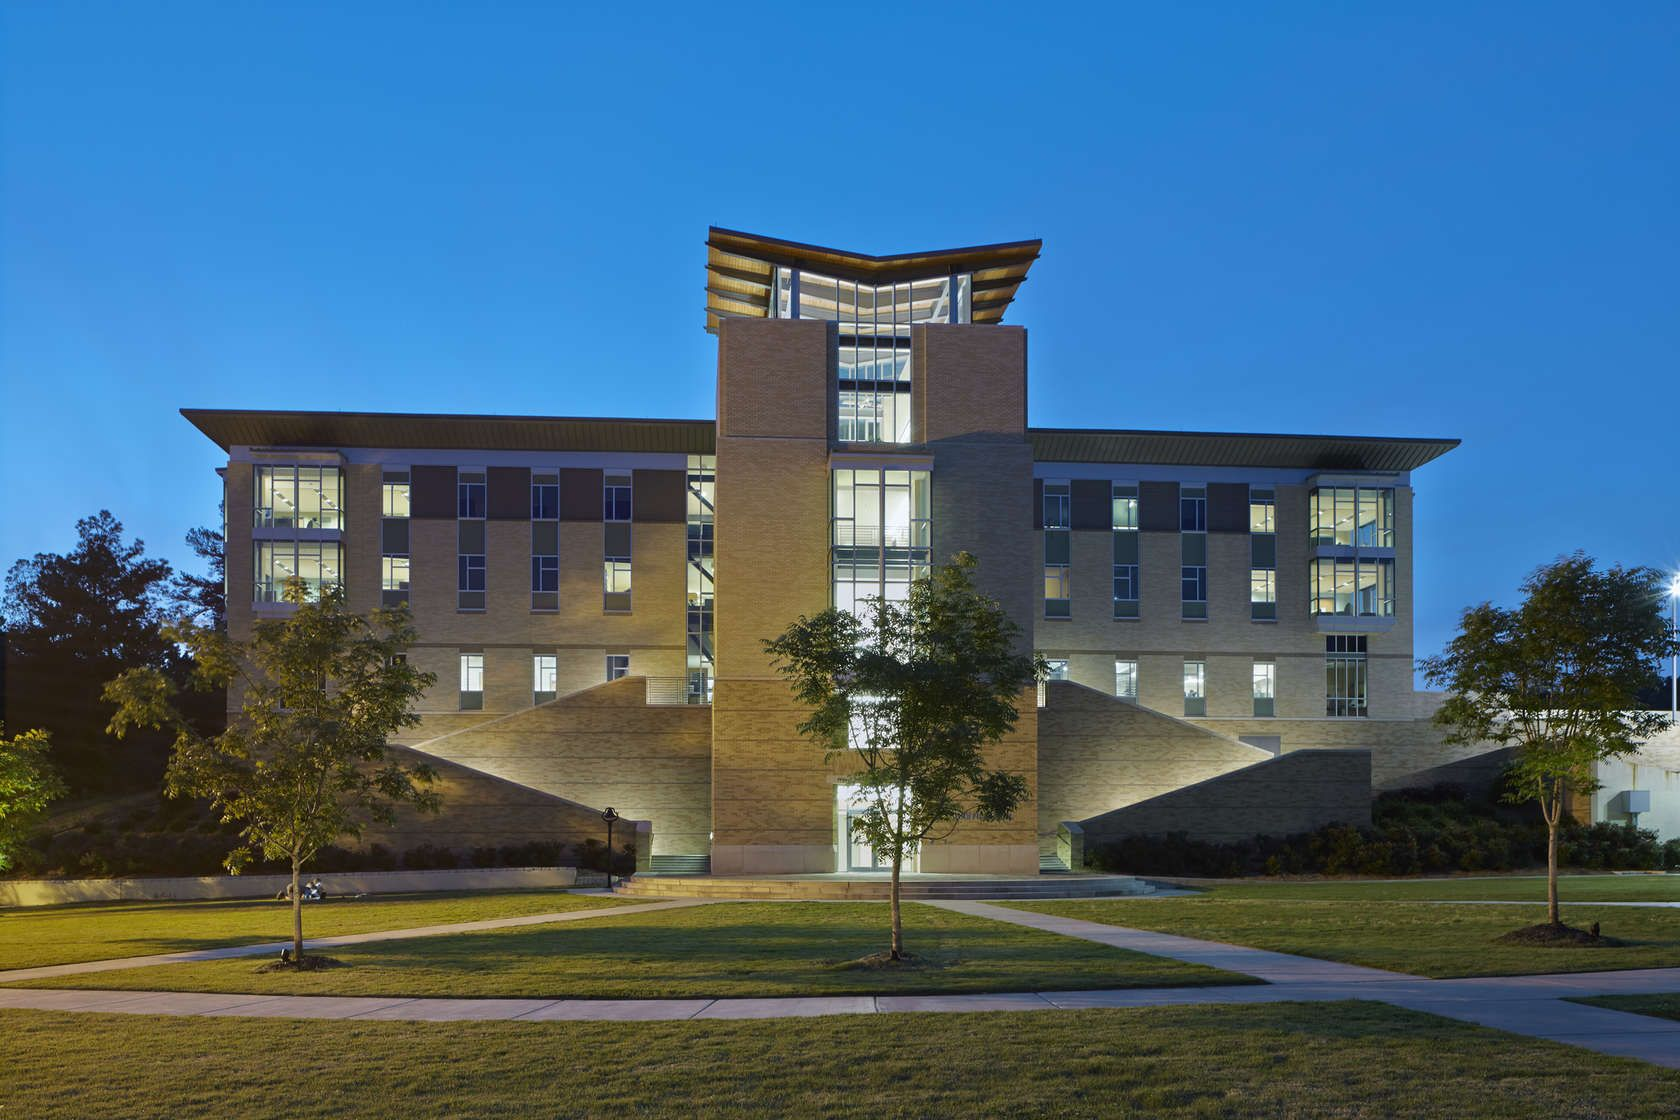 Arkansas School for Mathematics, Sciences, and the Arts